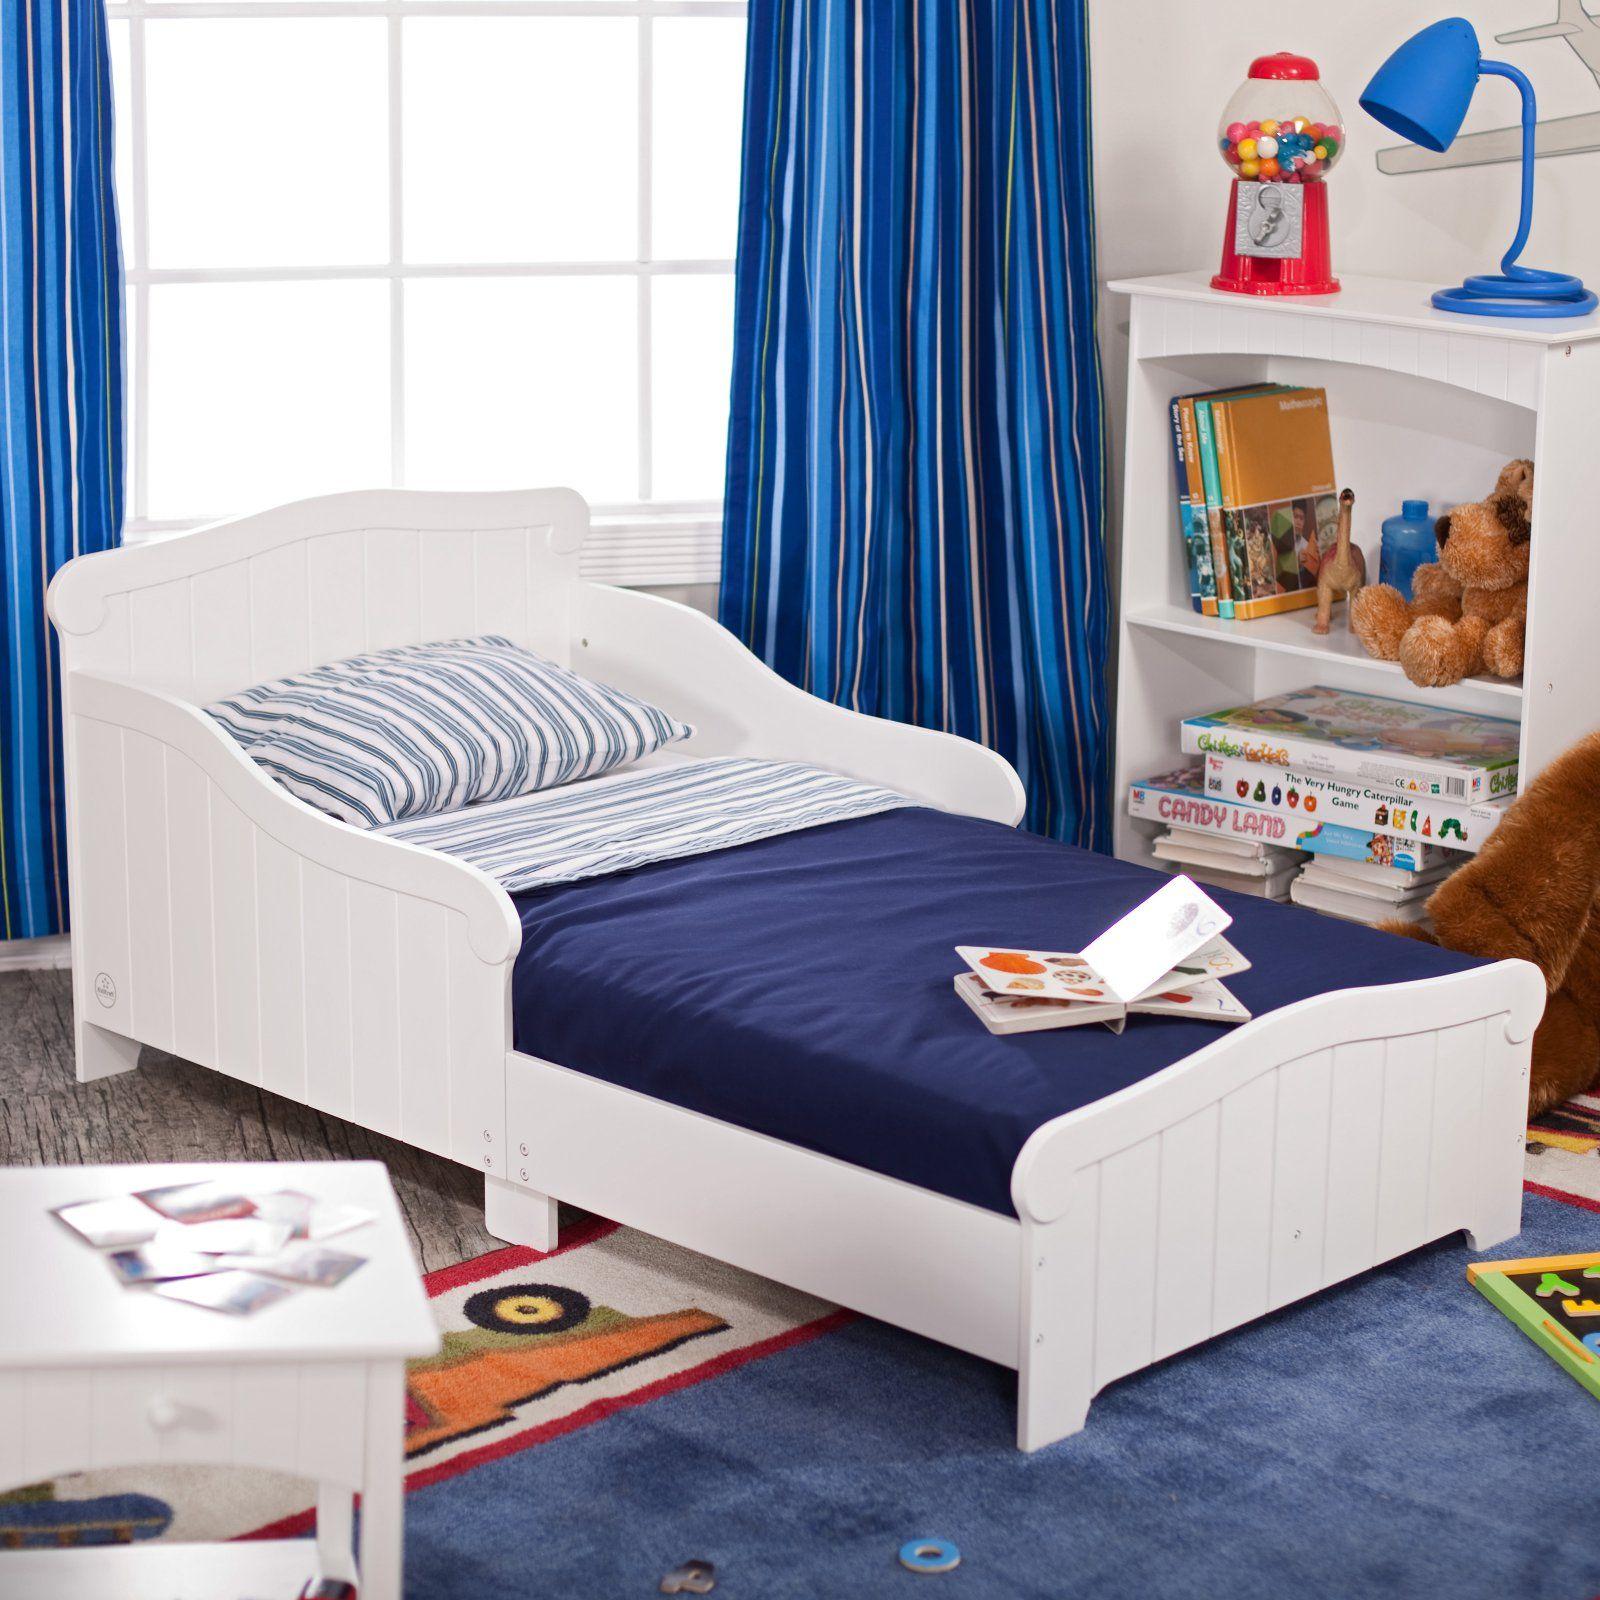 KidKraft Nantucket Toddler Bed - 86621 | Toddler boys room ...